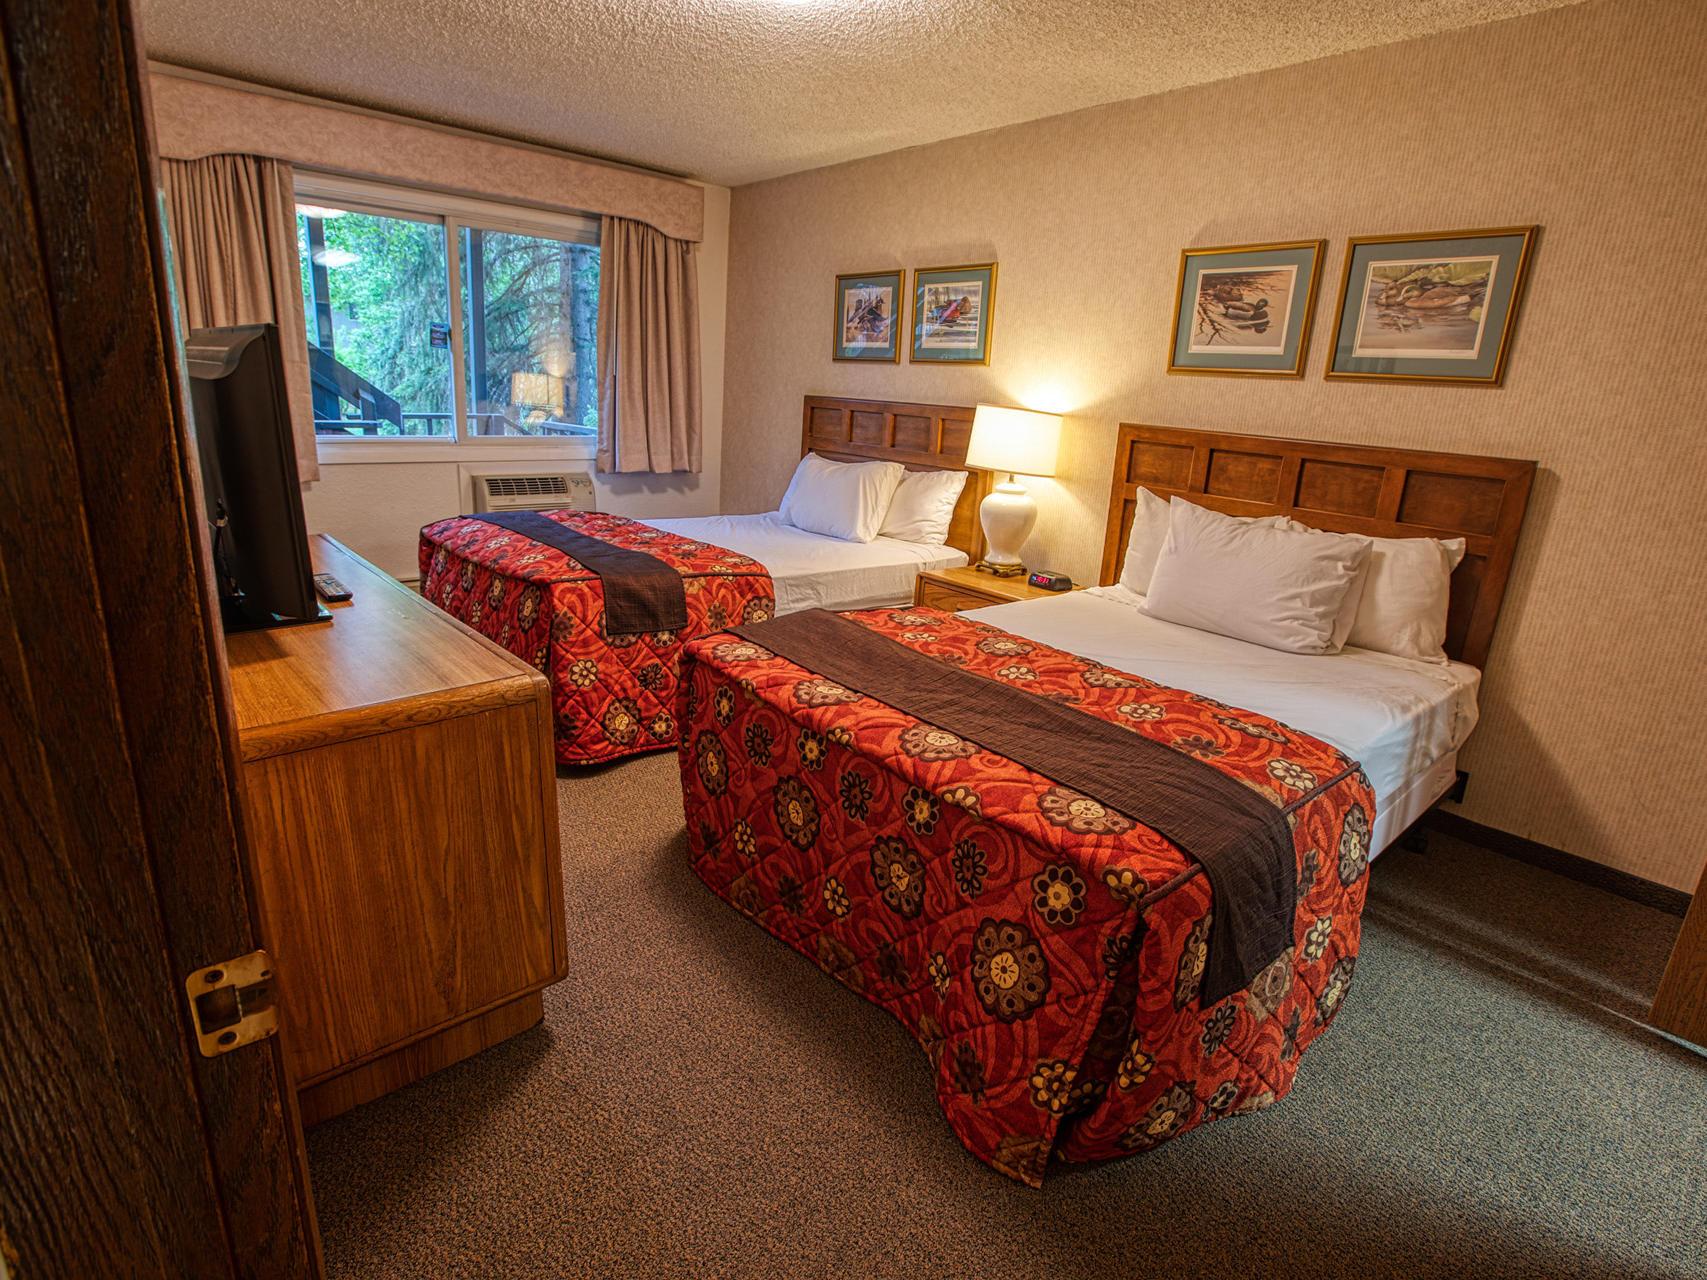 View of the deluxe one bedroom suite at Wedgewood Resort